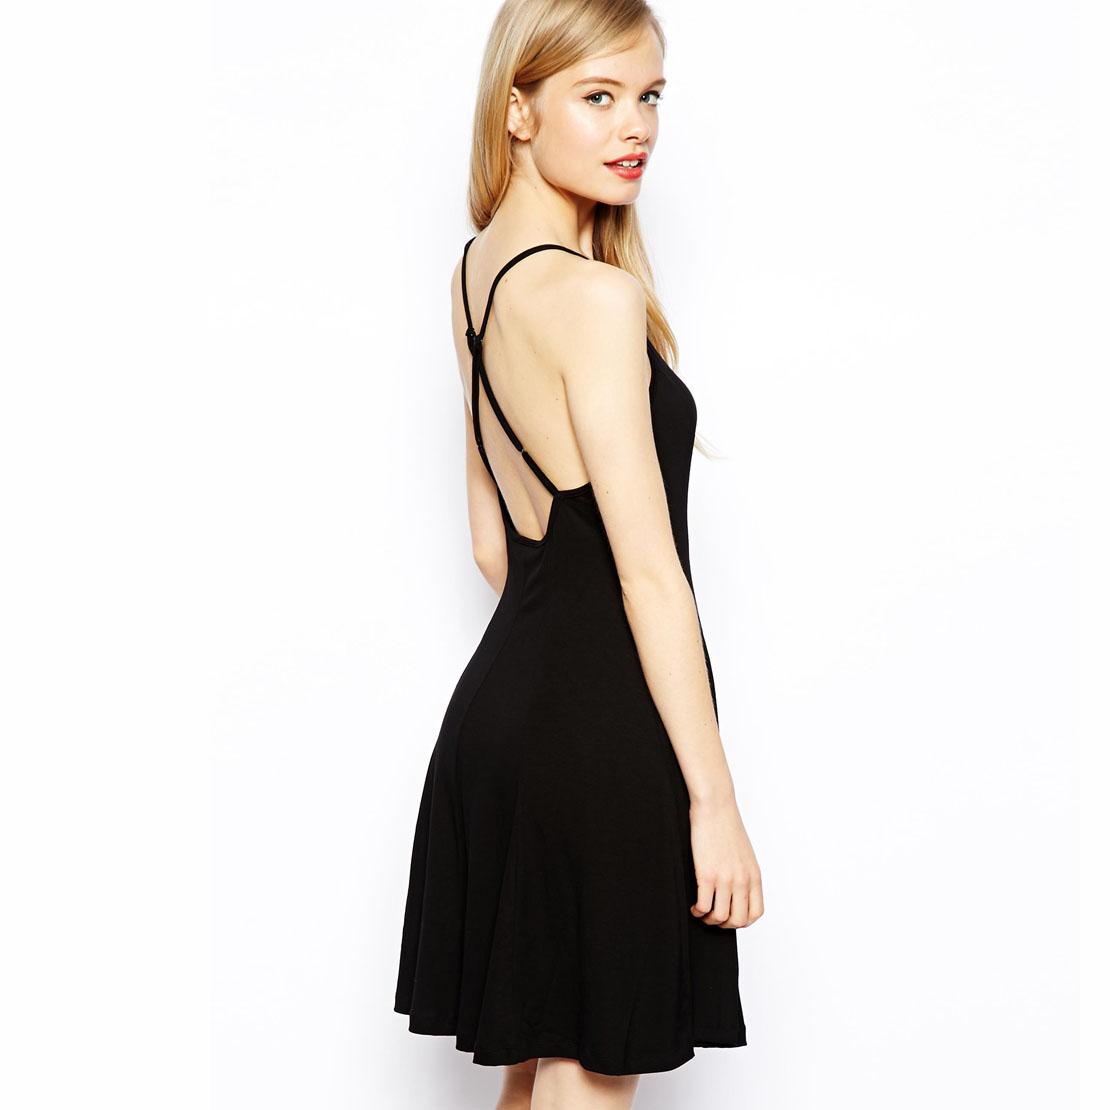 Basic models in Europe and America elegant adjustable cross strap black dress knitted fabrics haoduoyi